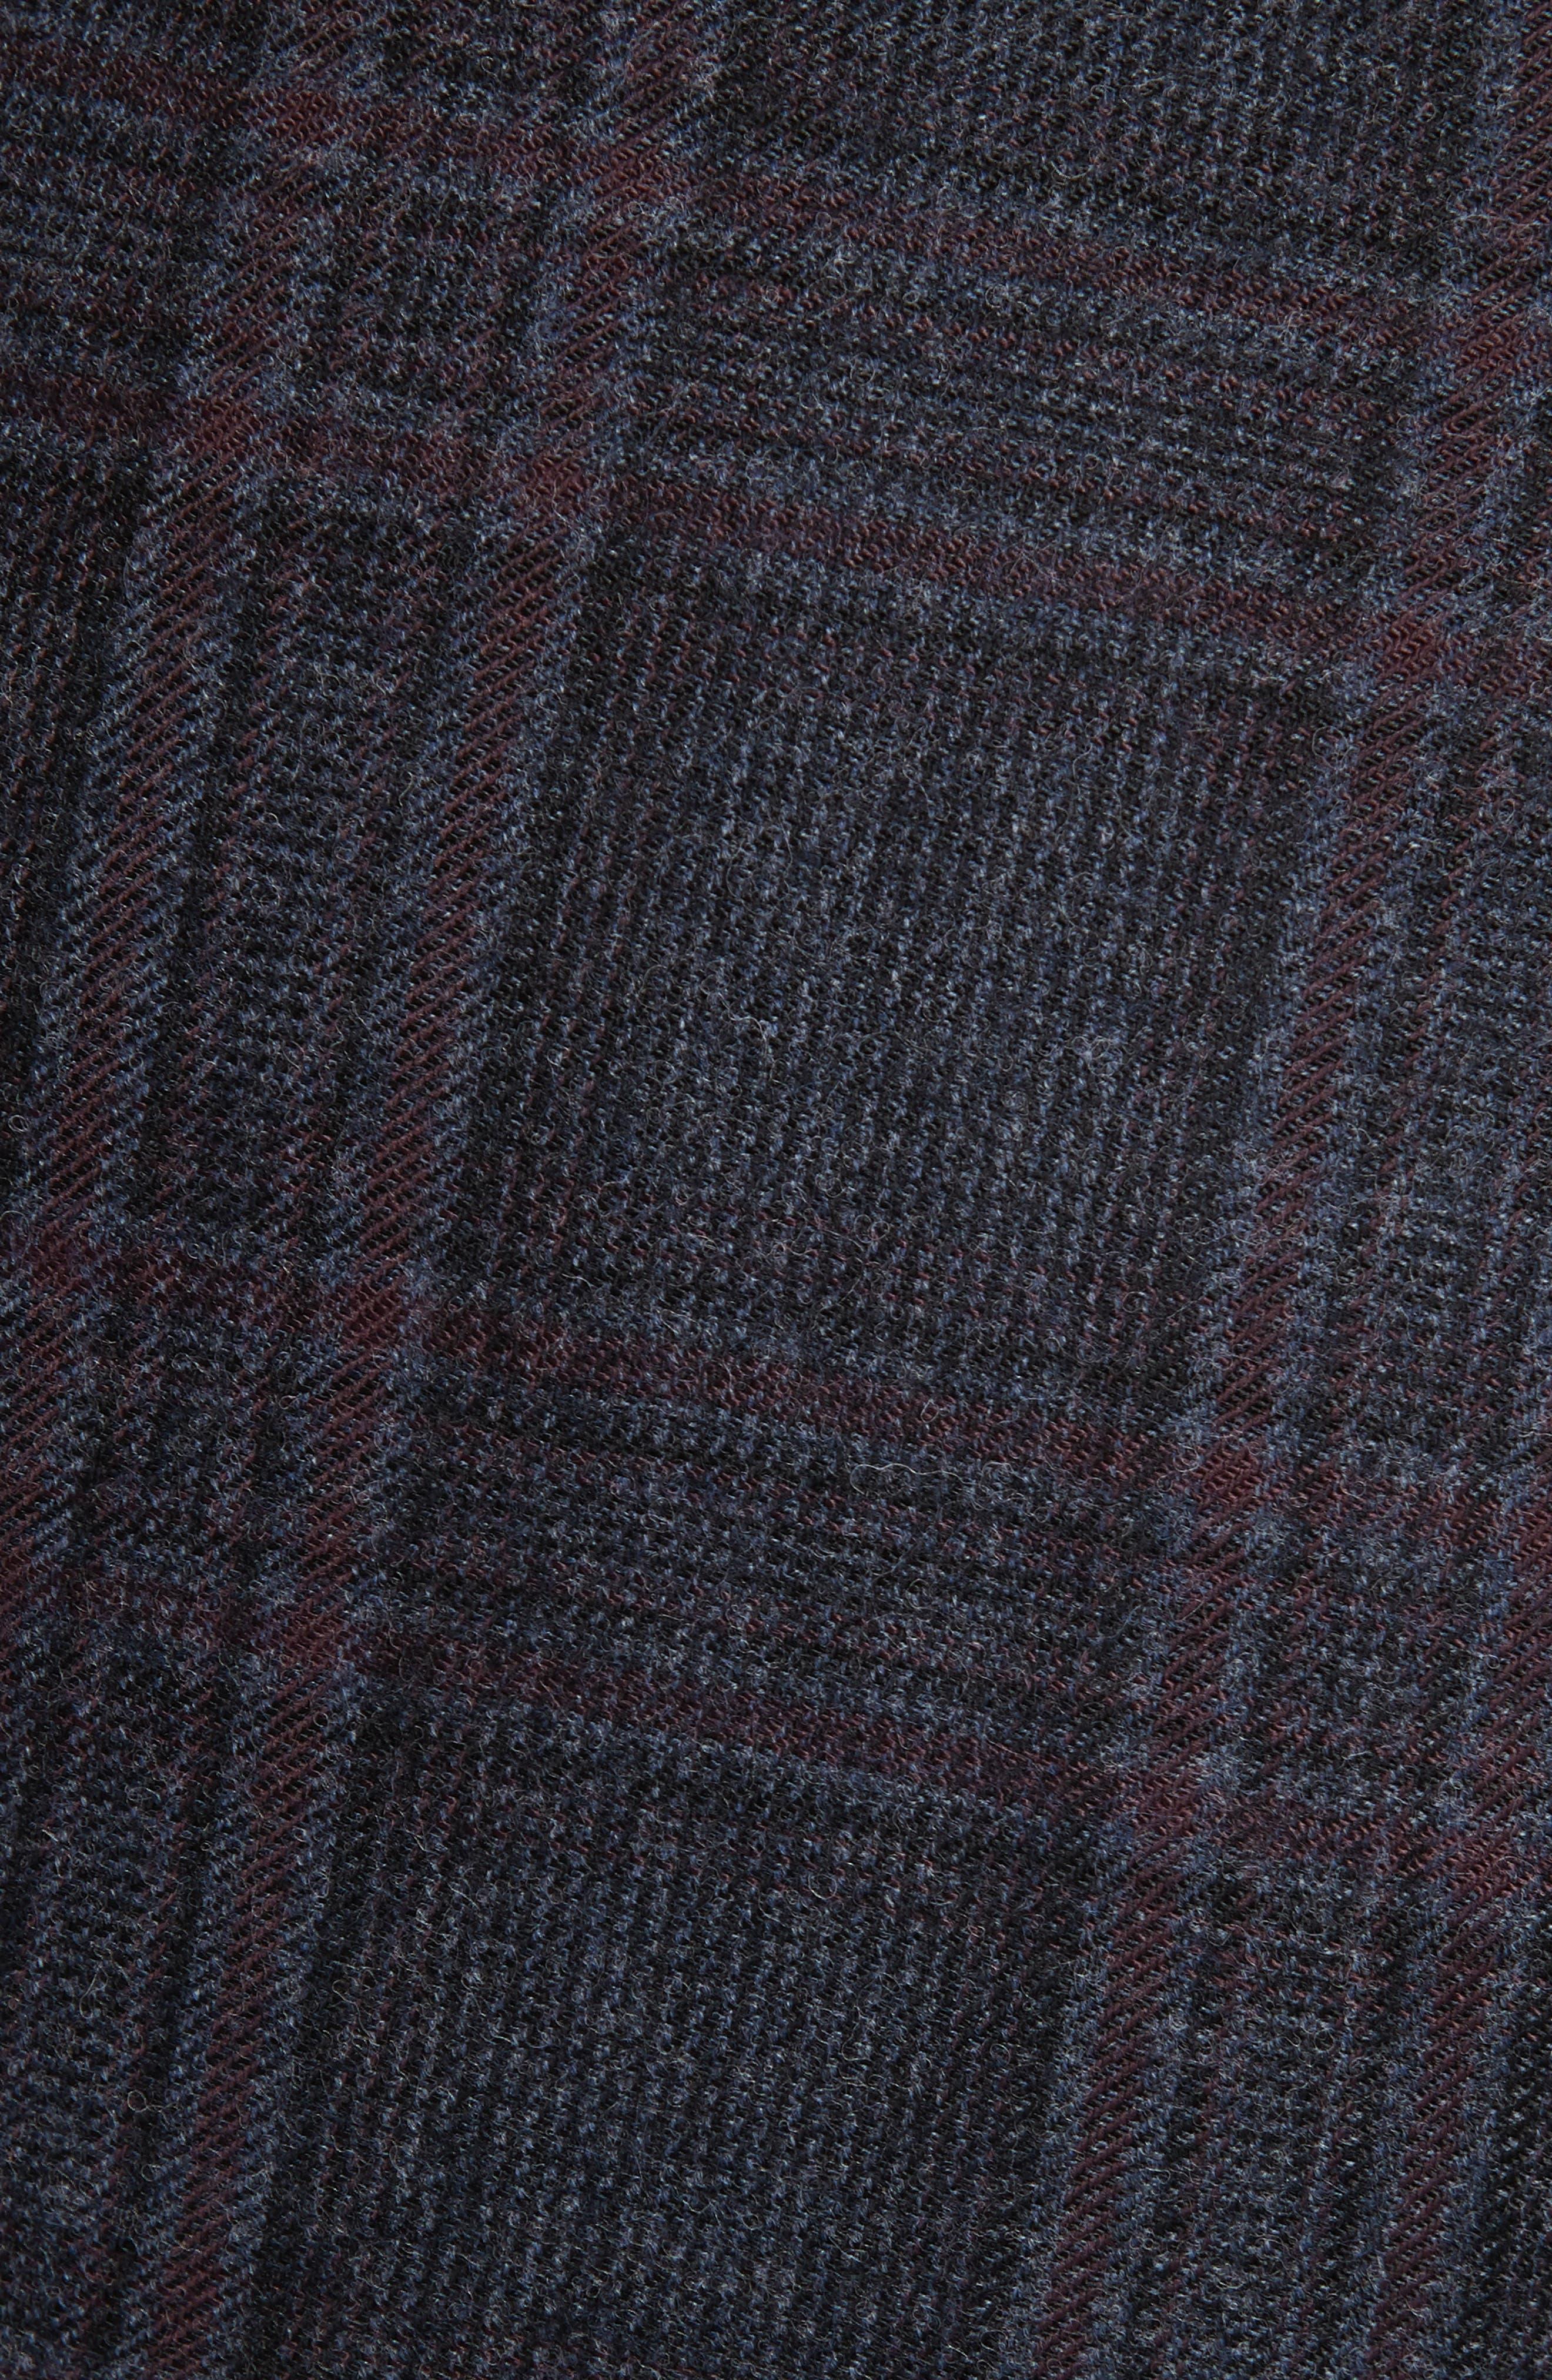 Plaid Stretch Wool Blend Pants,                             Alternate thumbnail 5, color,                             BLUE